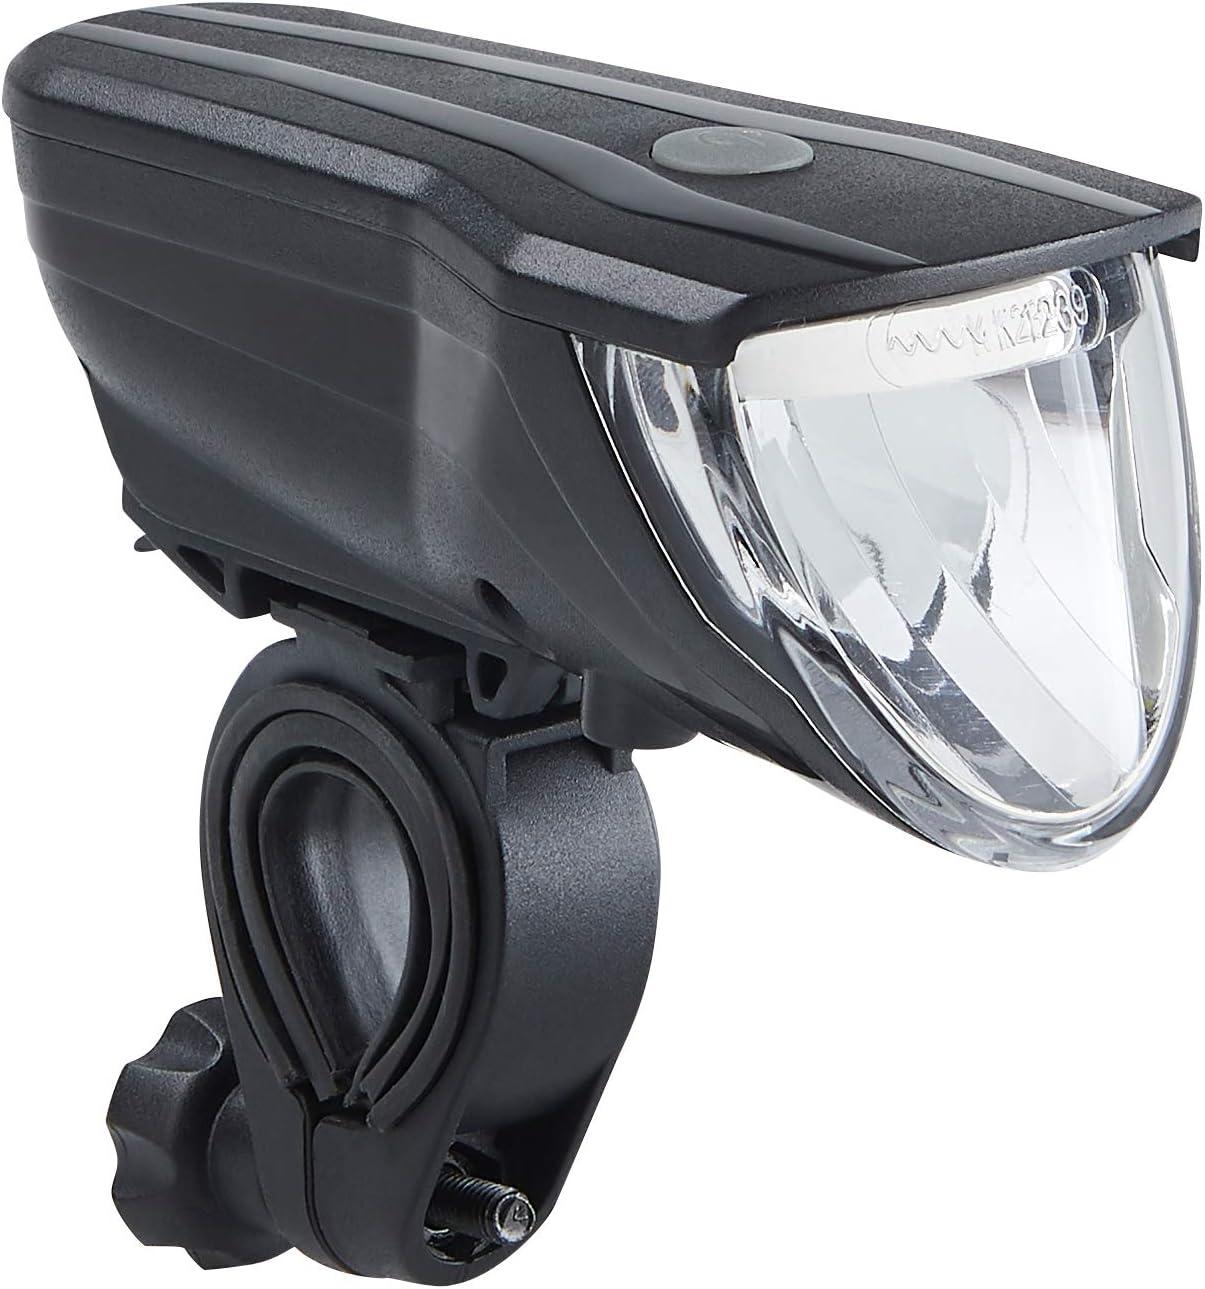 StVZO zugelassen 51227500 Fahrradbeleuchtungsset B/üchel Unisex-Adult Vancouver Pro one Size /& Vancouver Pro Silber//Schwarz 70 Lux schwarz LED Akku-Leuchten-Set 70 Lux LED Akkuleuchtenset